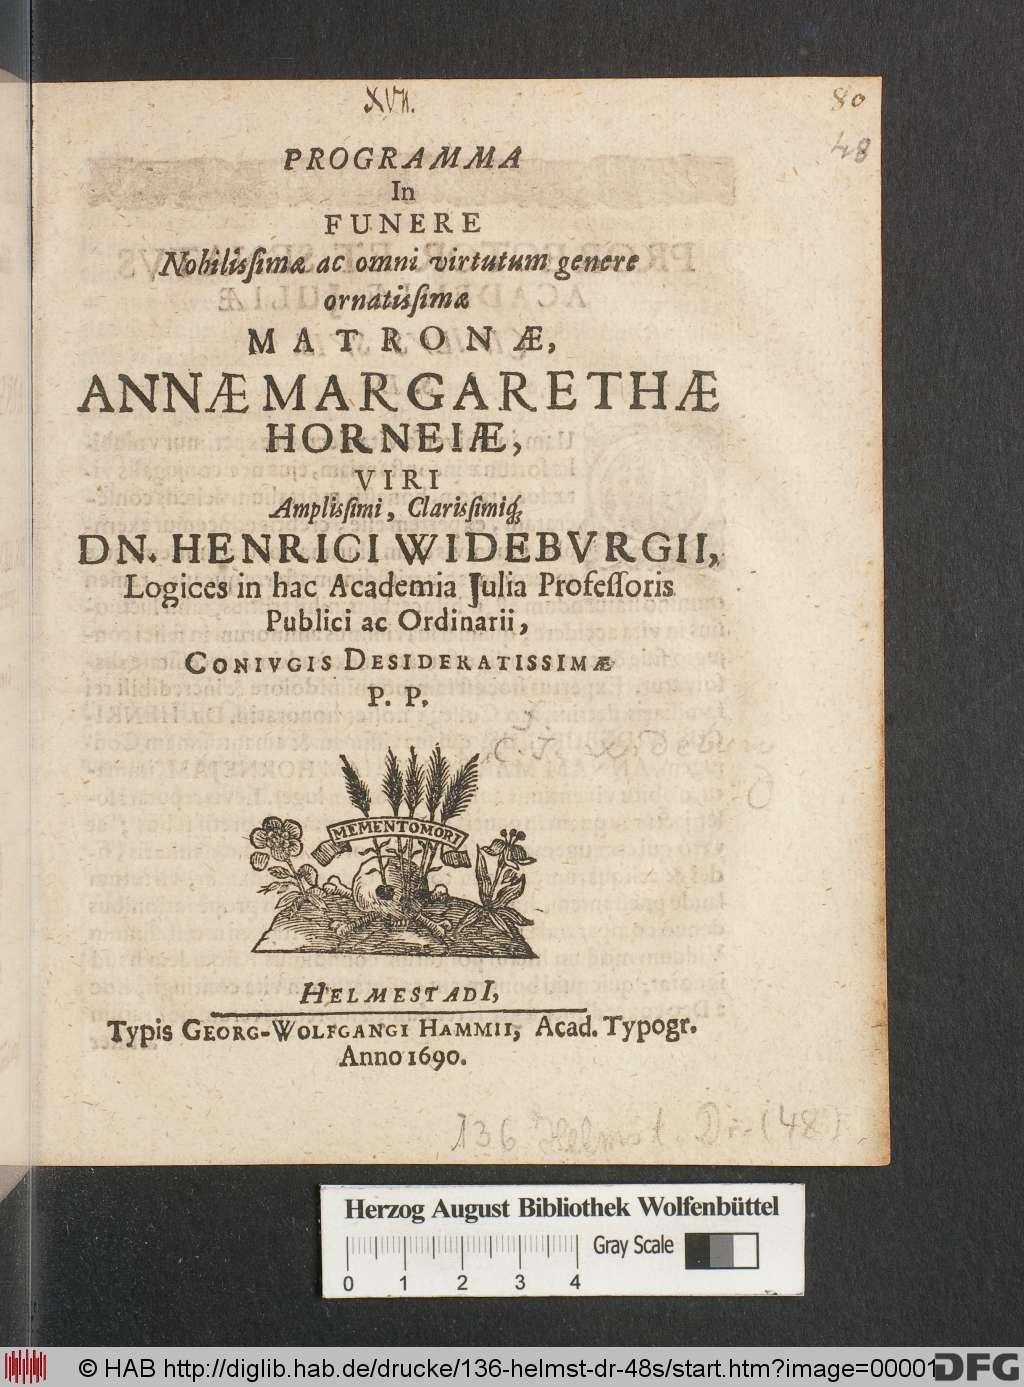 http://diglib.hab.de/drucke/136-helmst-dr-48s/00001.jpg